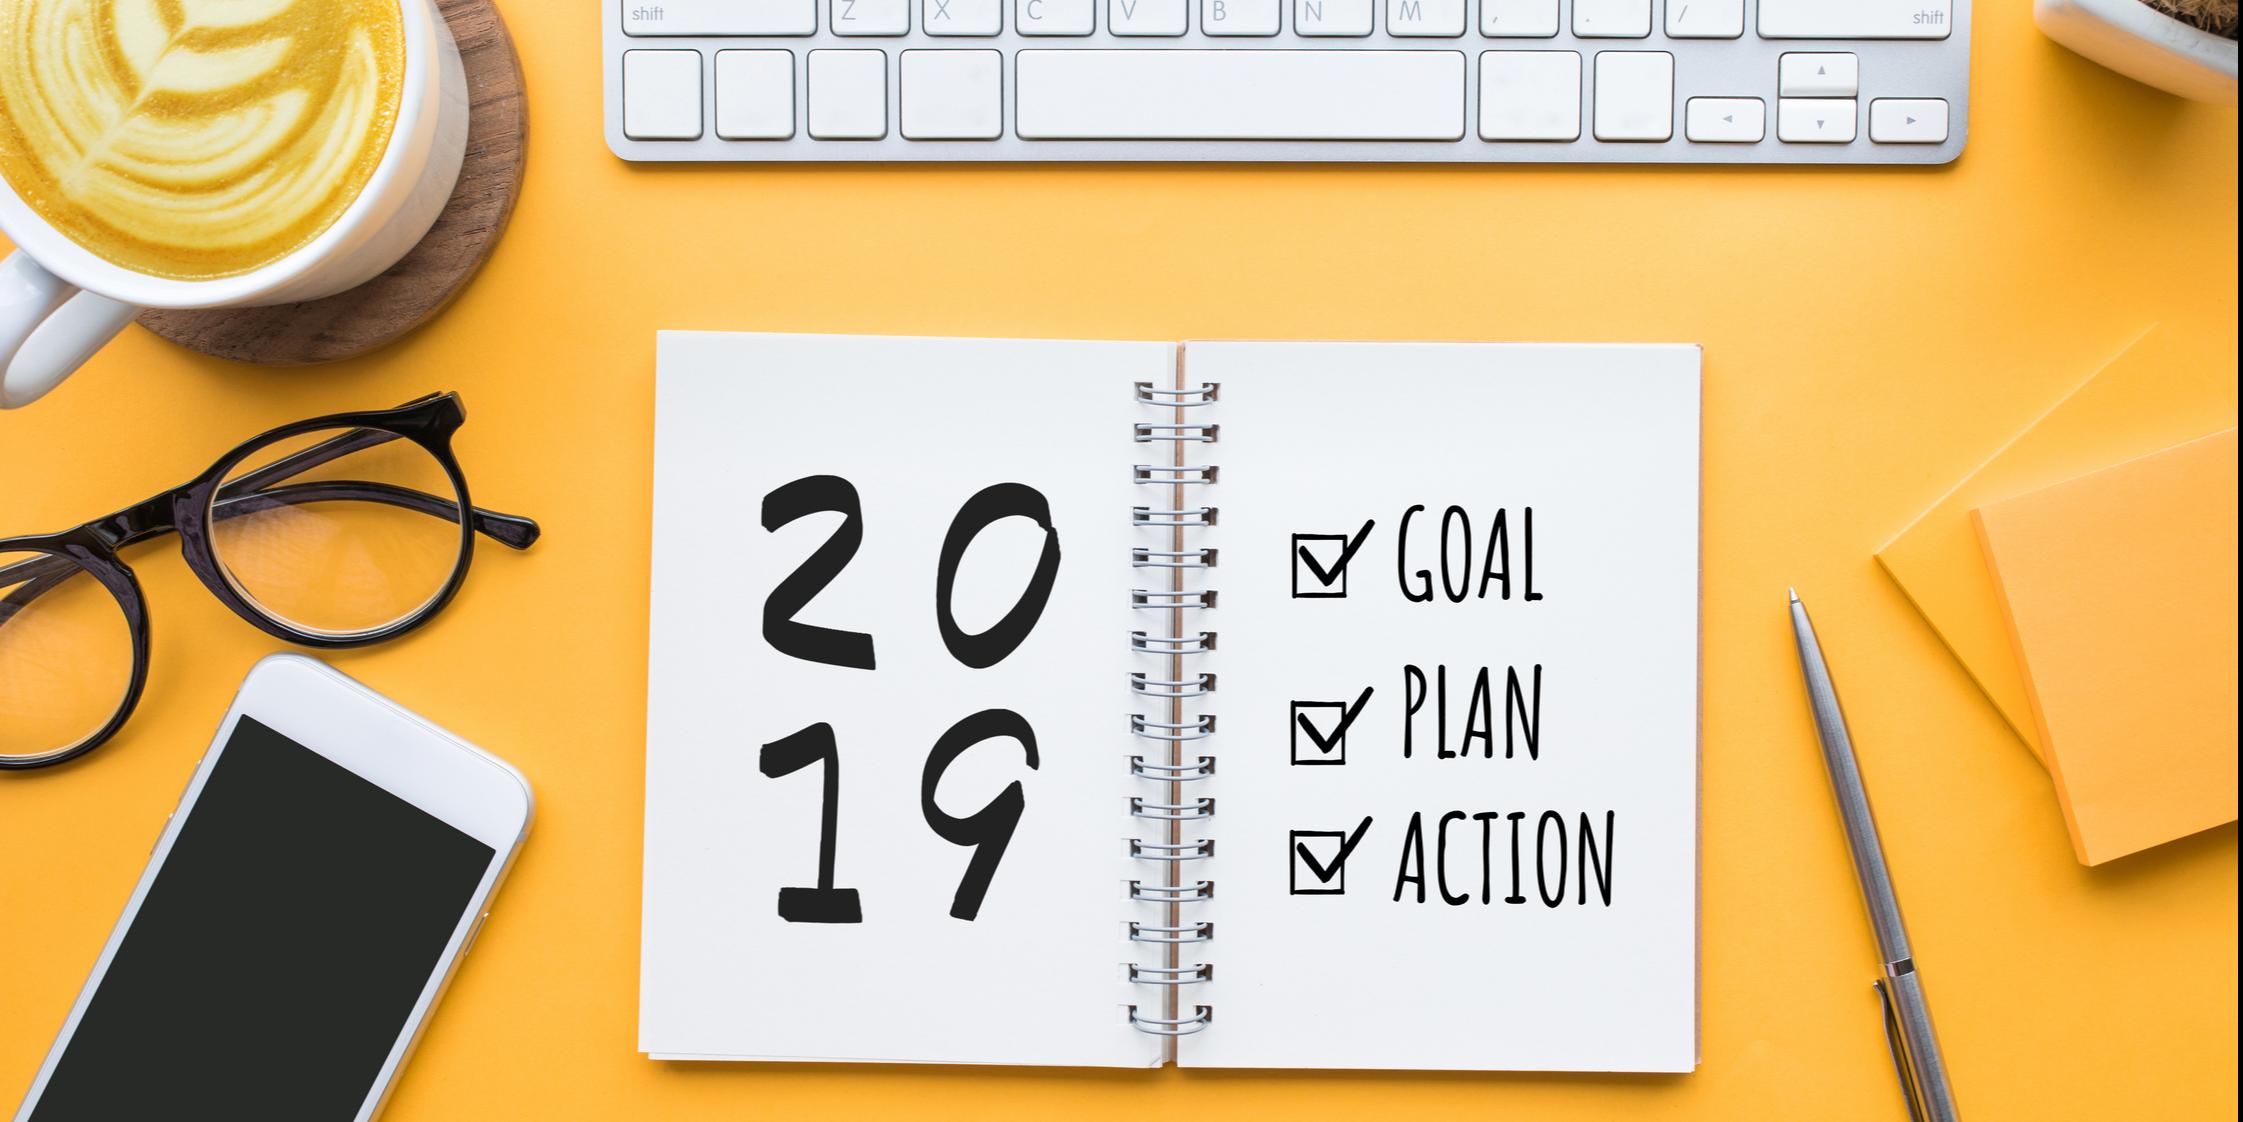 goals analytics to track in 2019